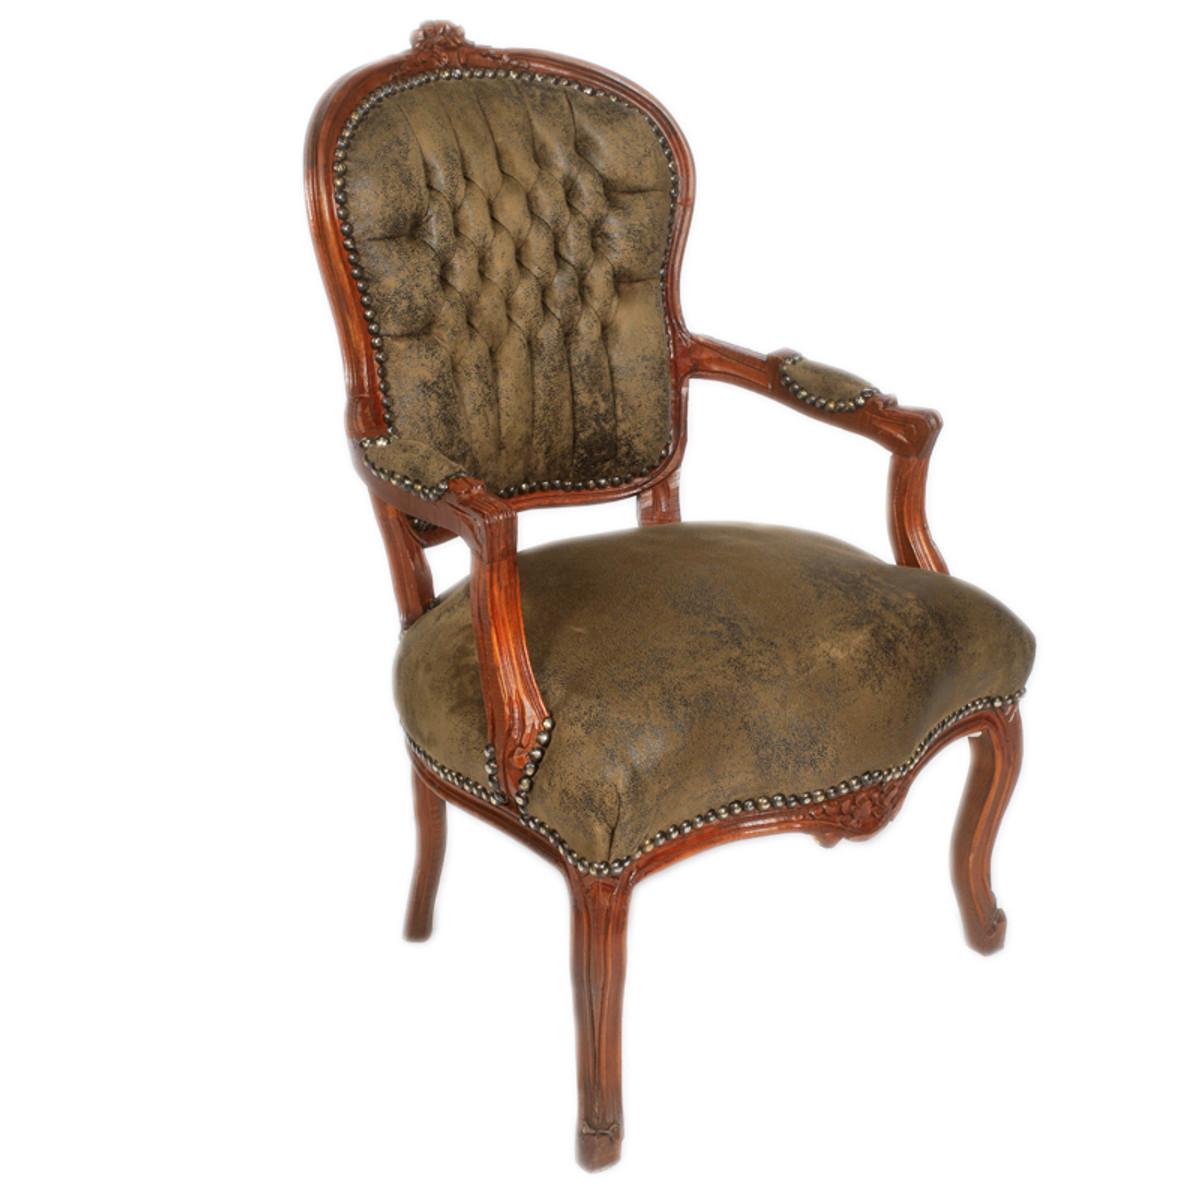 casa padrino barock salon stuhl braun lederoptik braun m bel antik stil st hle barock st hle. Black Bedroom Furniture Sets. Home Design Ideas